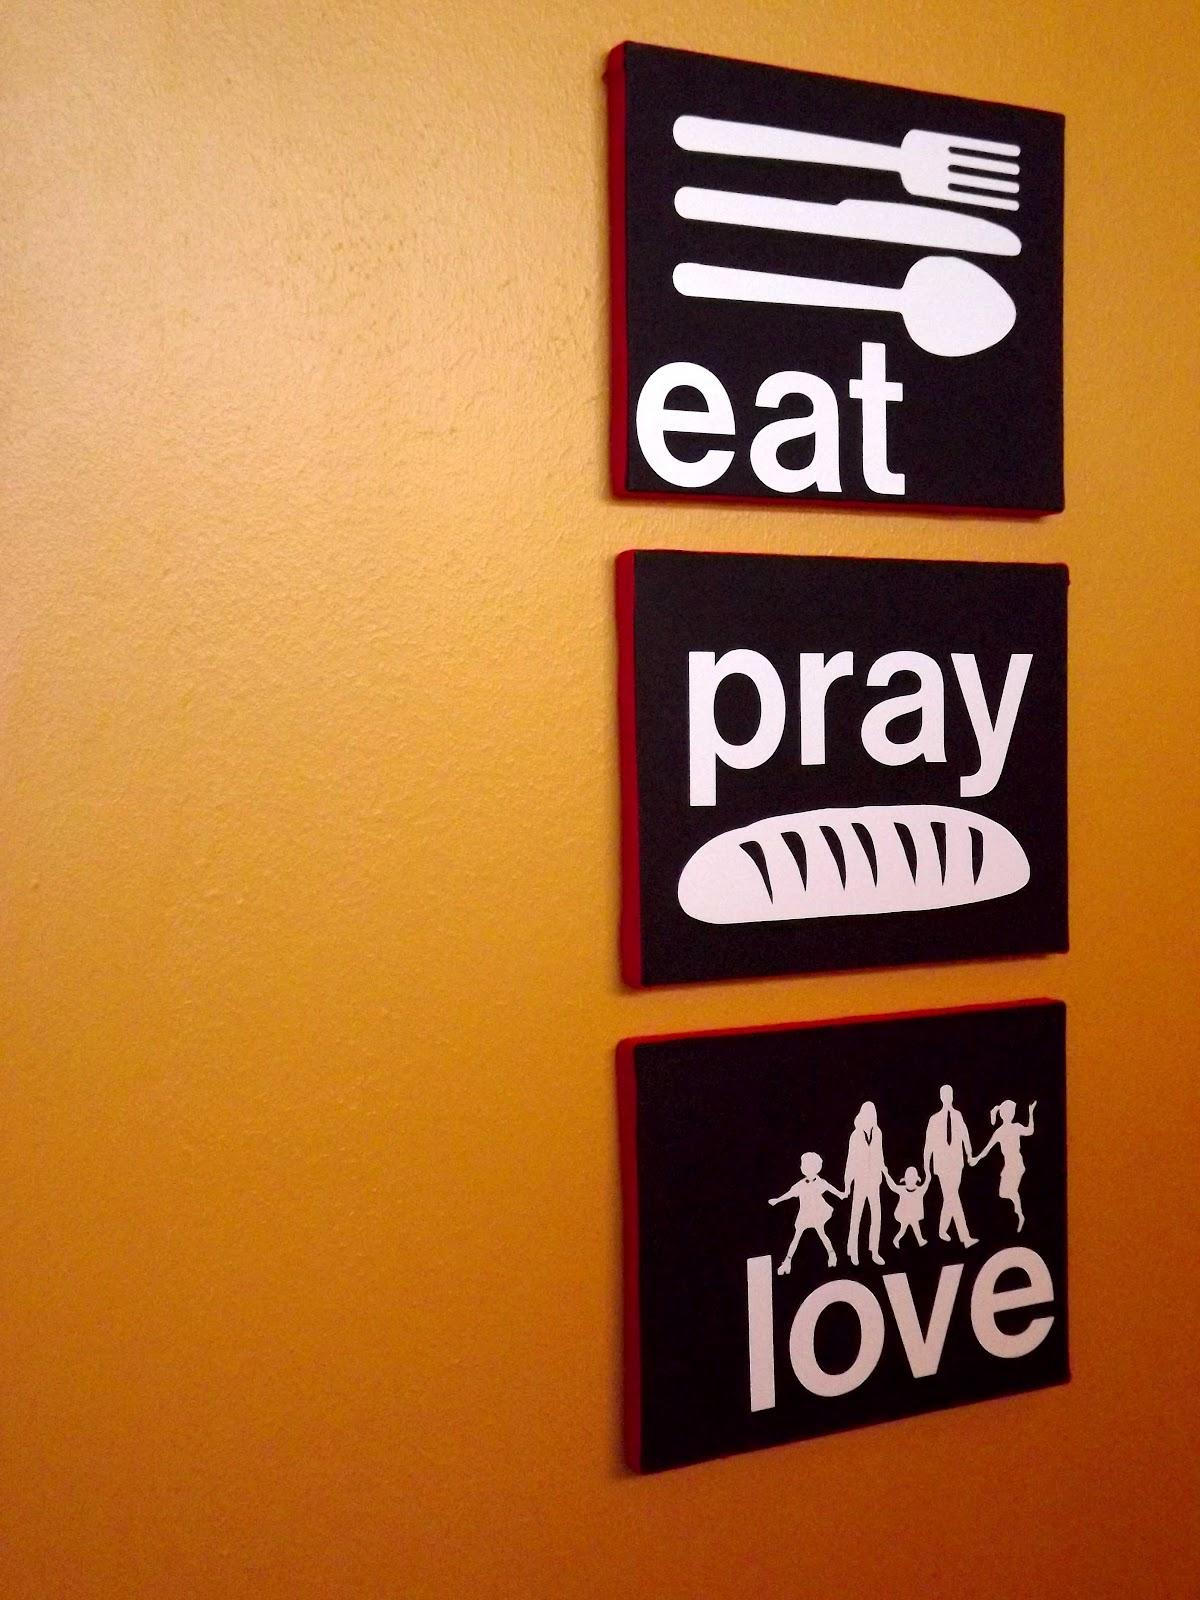 faith hope and art eat pray love custom dining room wall art. Black Bedroom Furniture Sets. Home Design Ideas